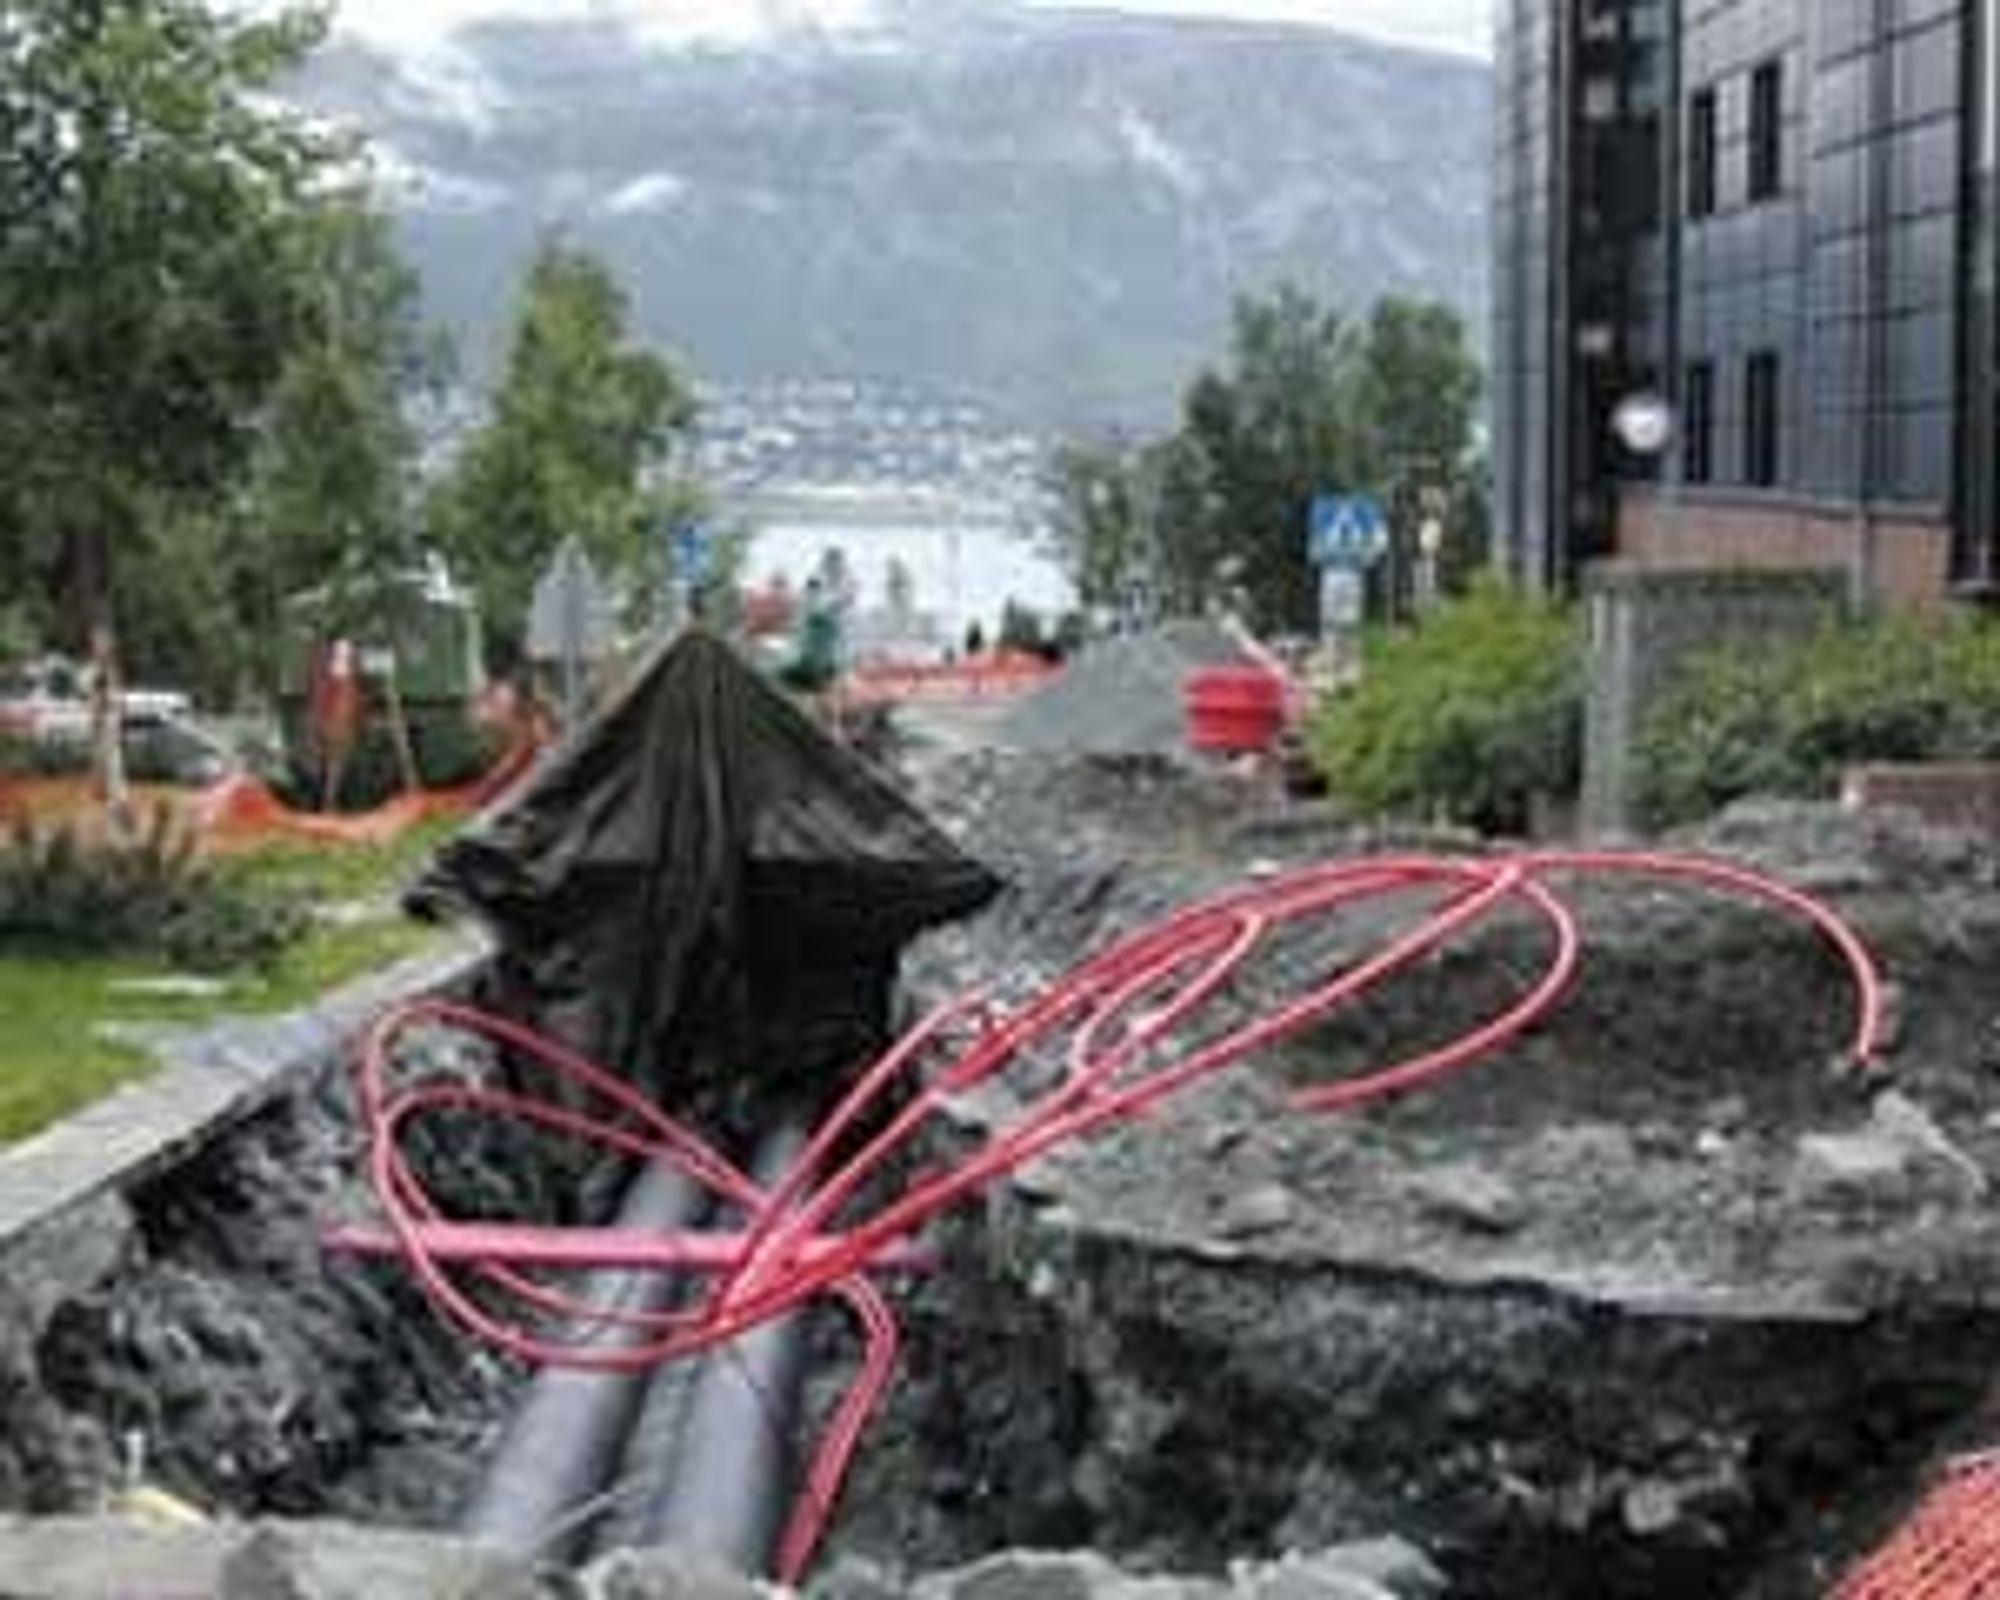 I Tromsø er fjernvarmeutbyggingen kommet godt i gang. Her fra rørtraseen til Teorifagbygget ved UiT. Nå kommer Sørlandet etter. Foto: UiT